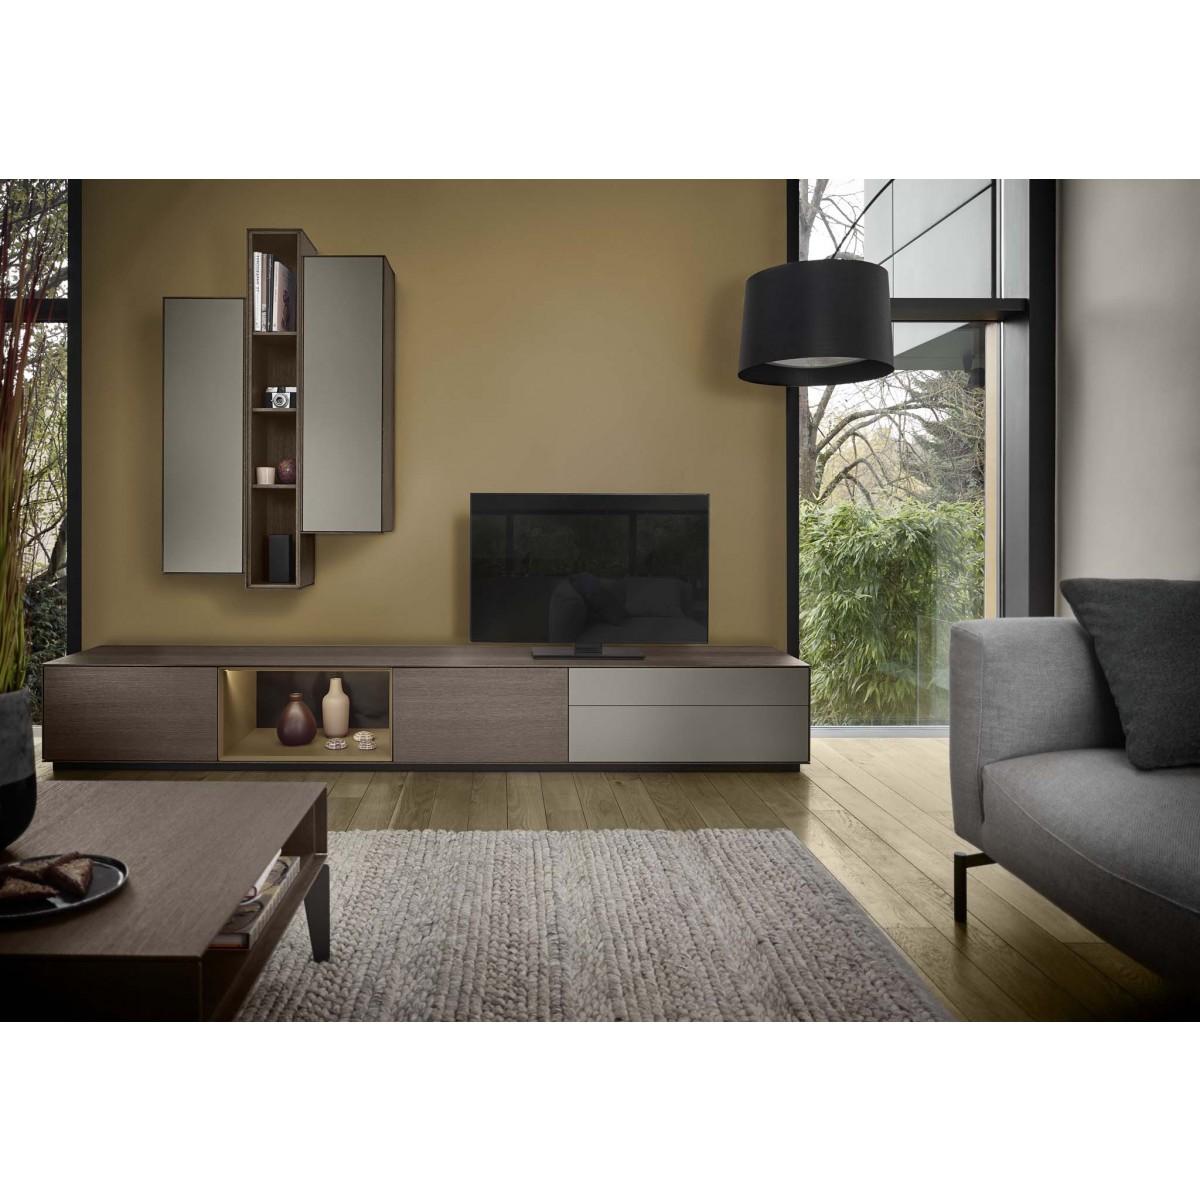 tv-meubel-sokkel-dressoir-bloom-eiken-BL1-miltonhouse